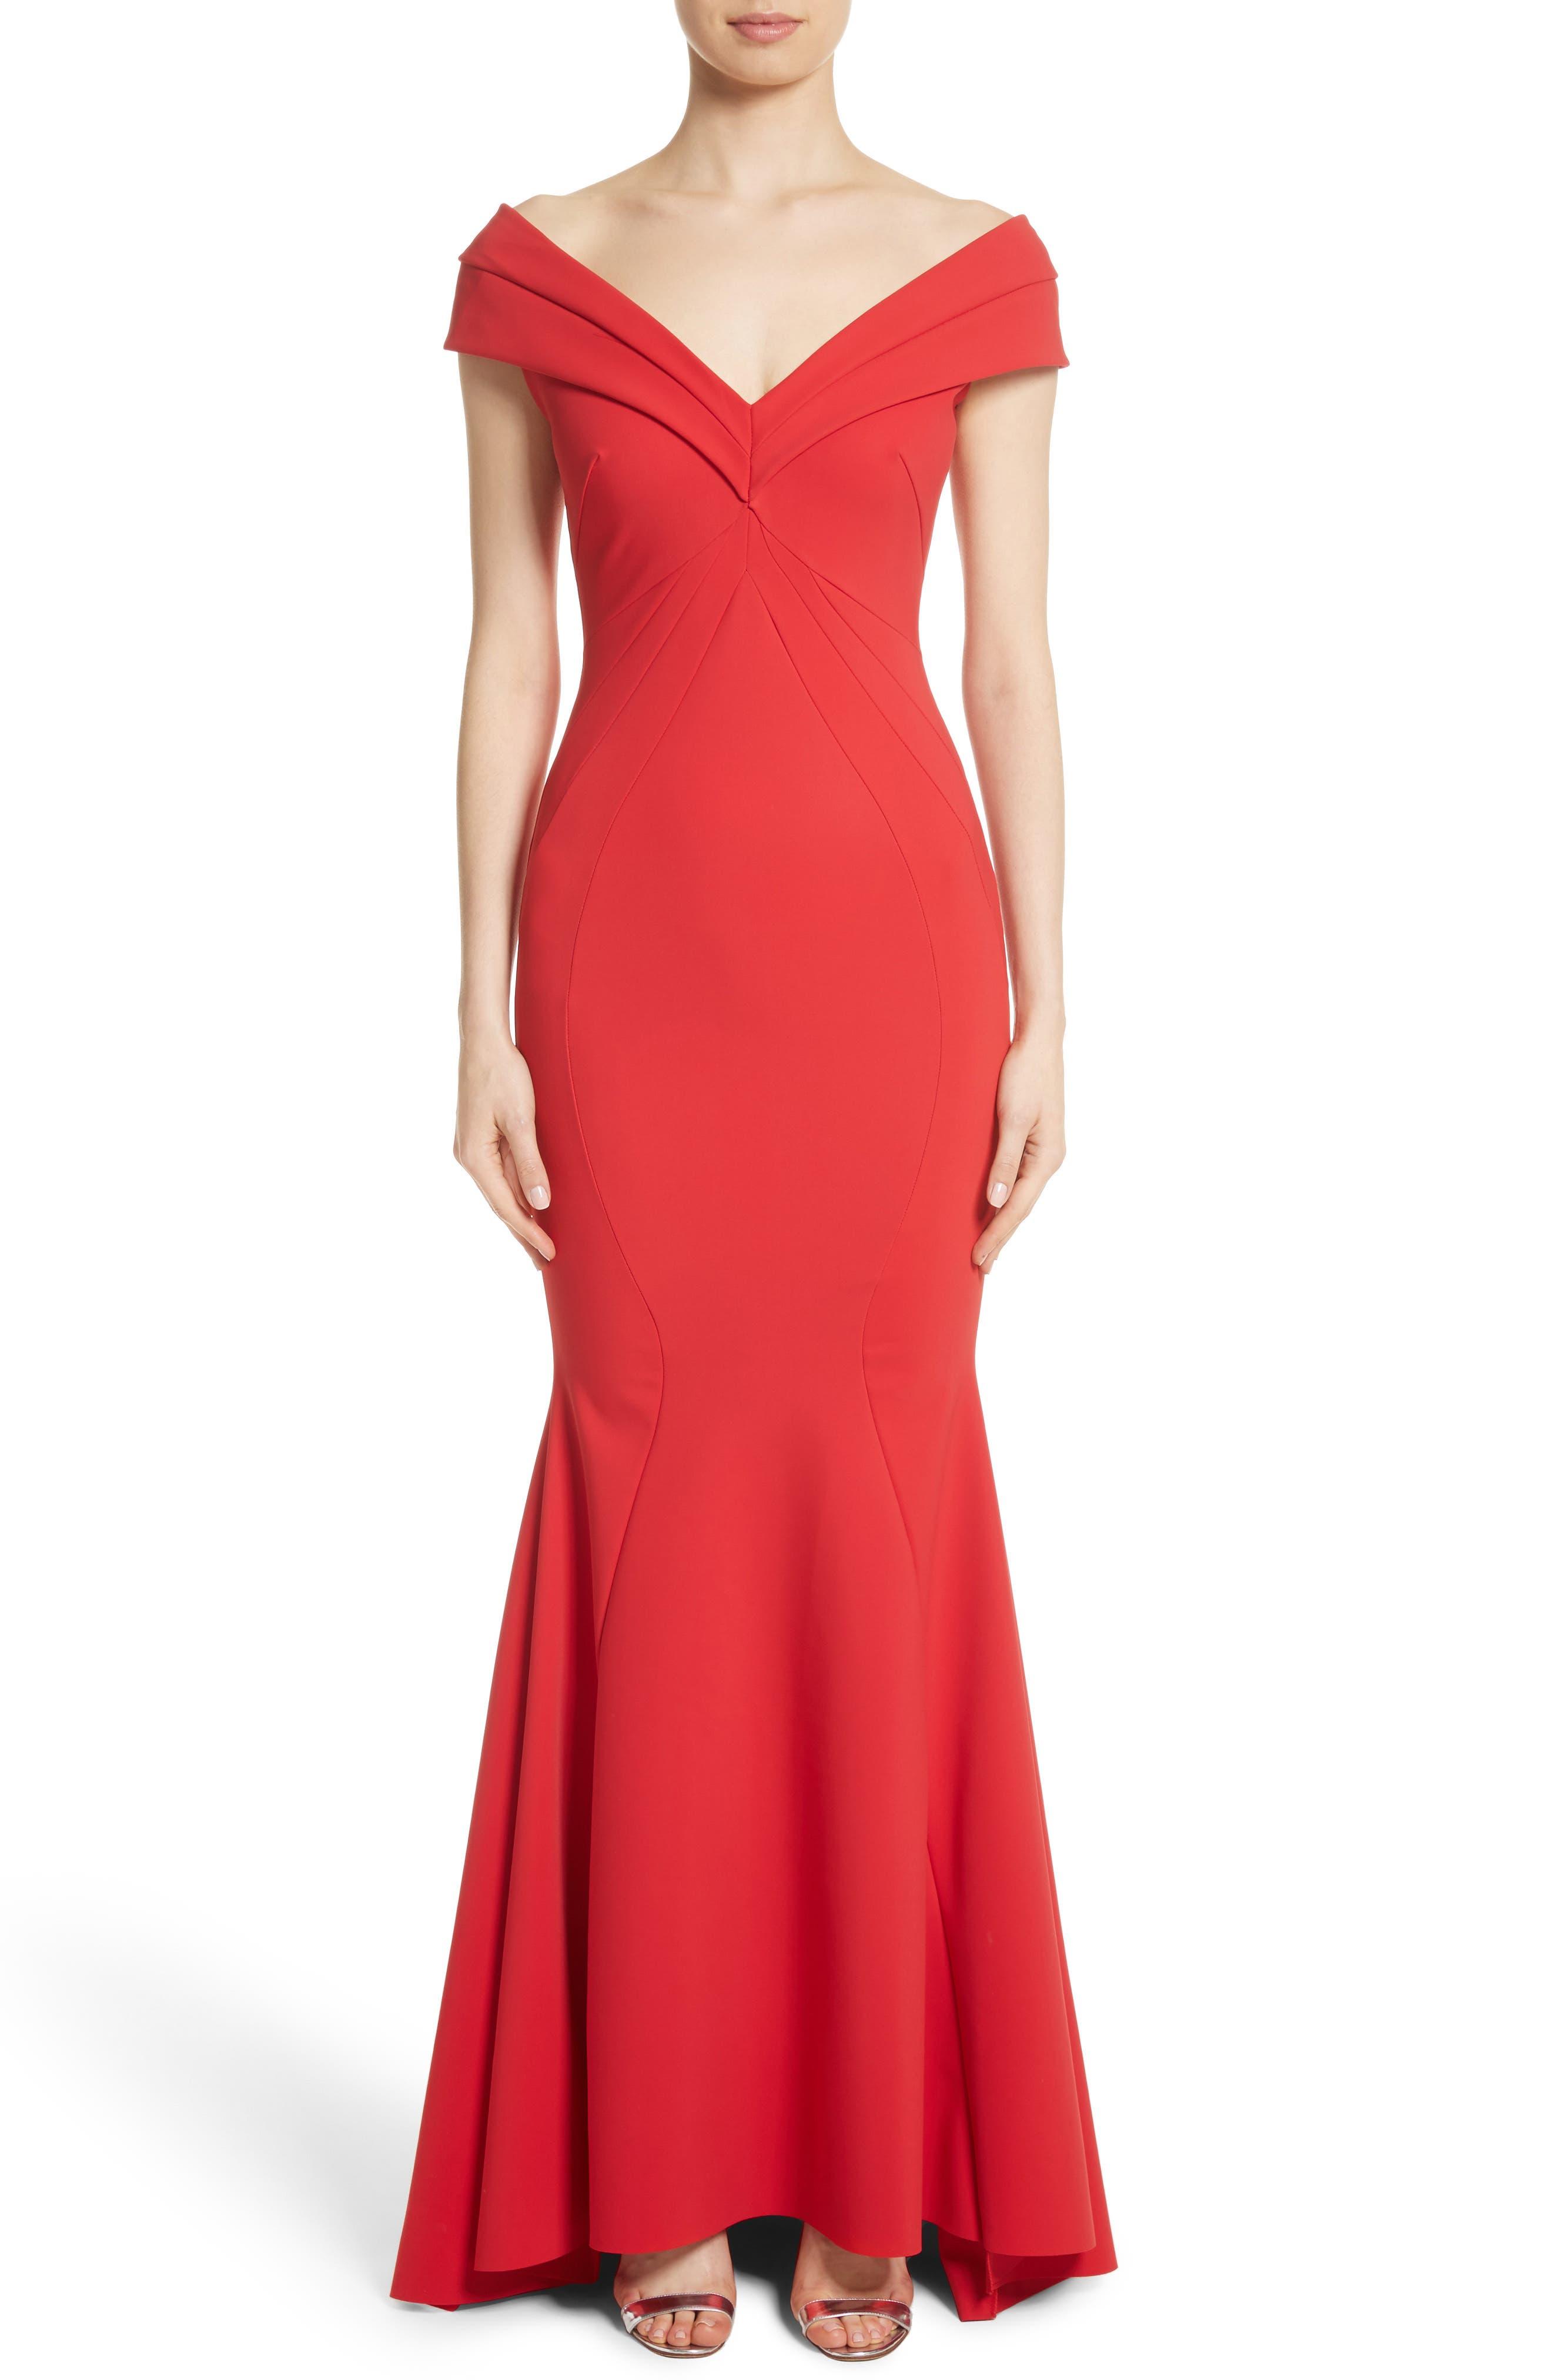 Alternate Image 1 Selected - Chiara Boni La Petite Robe Tally Off the Shoulder Trumpet Gown